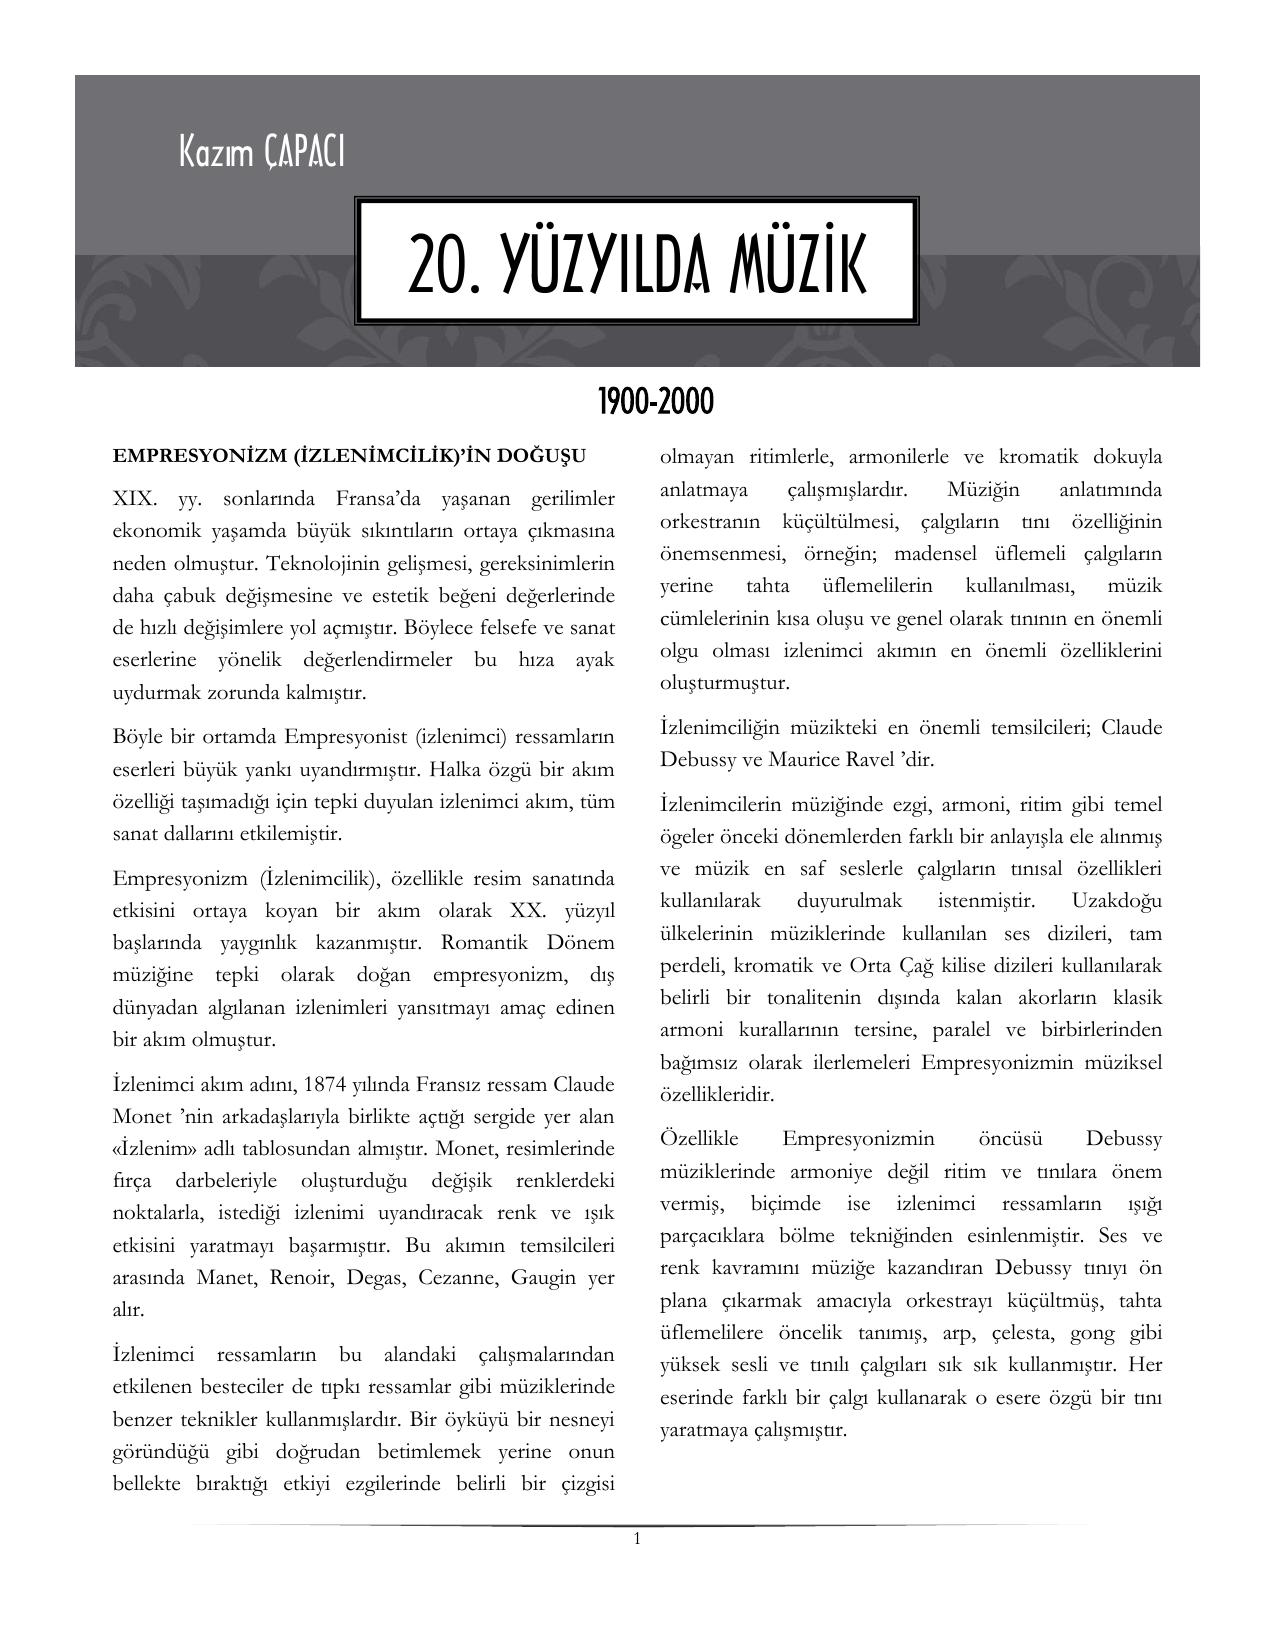 N. A. Rimsky-Korsakov. Bestecinin biyografisi 25